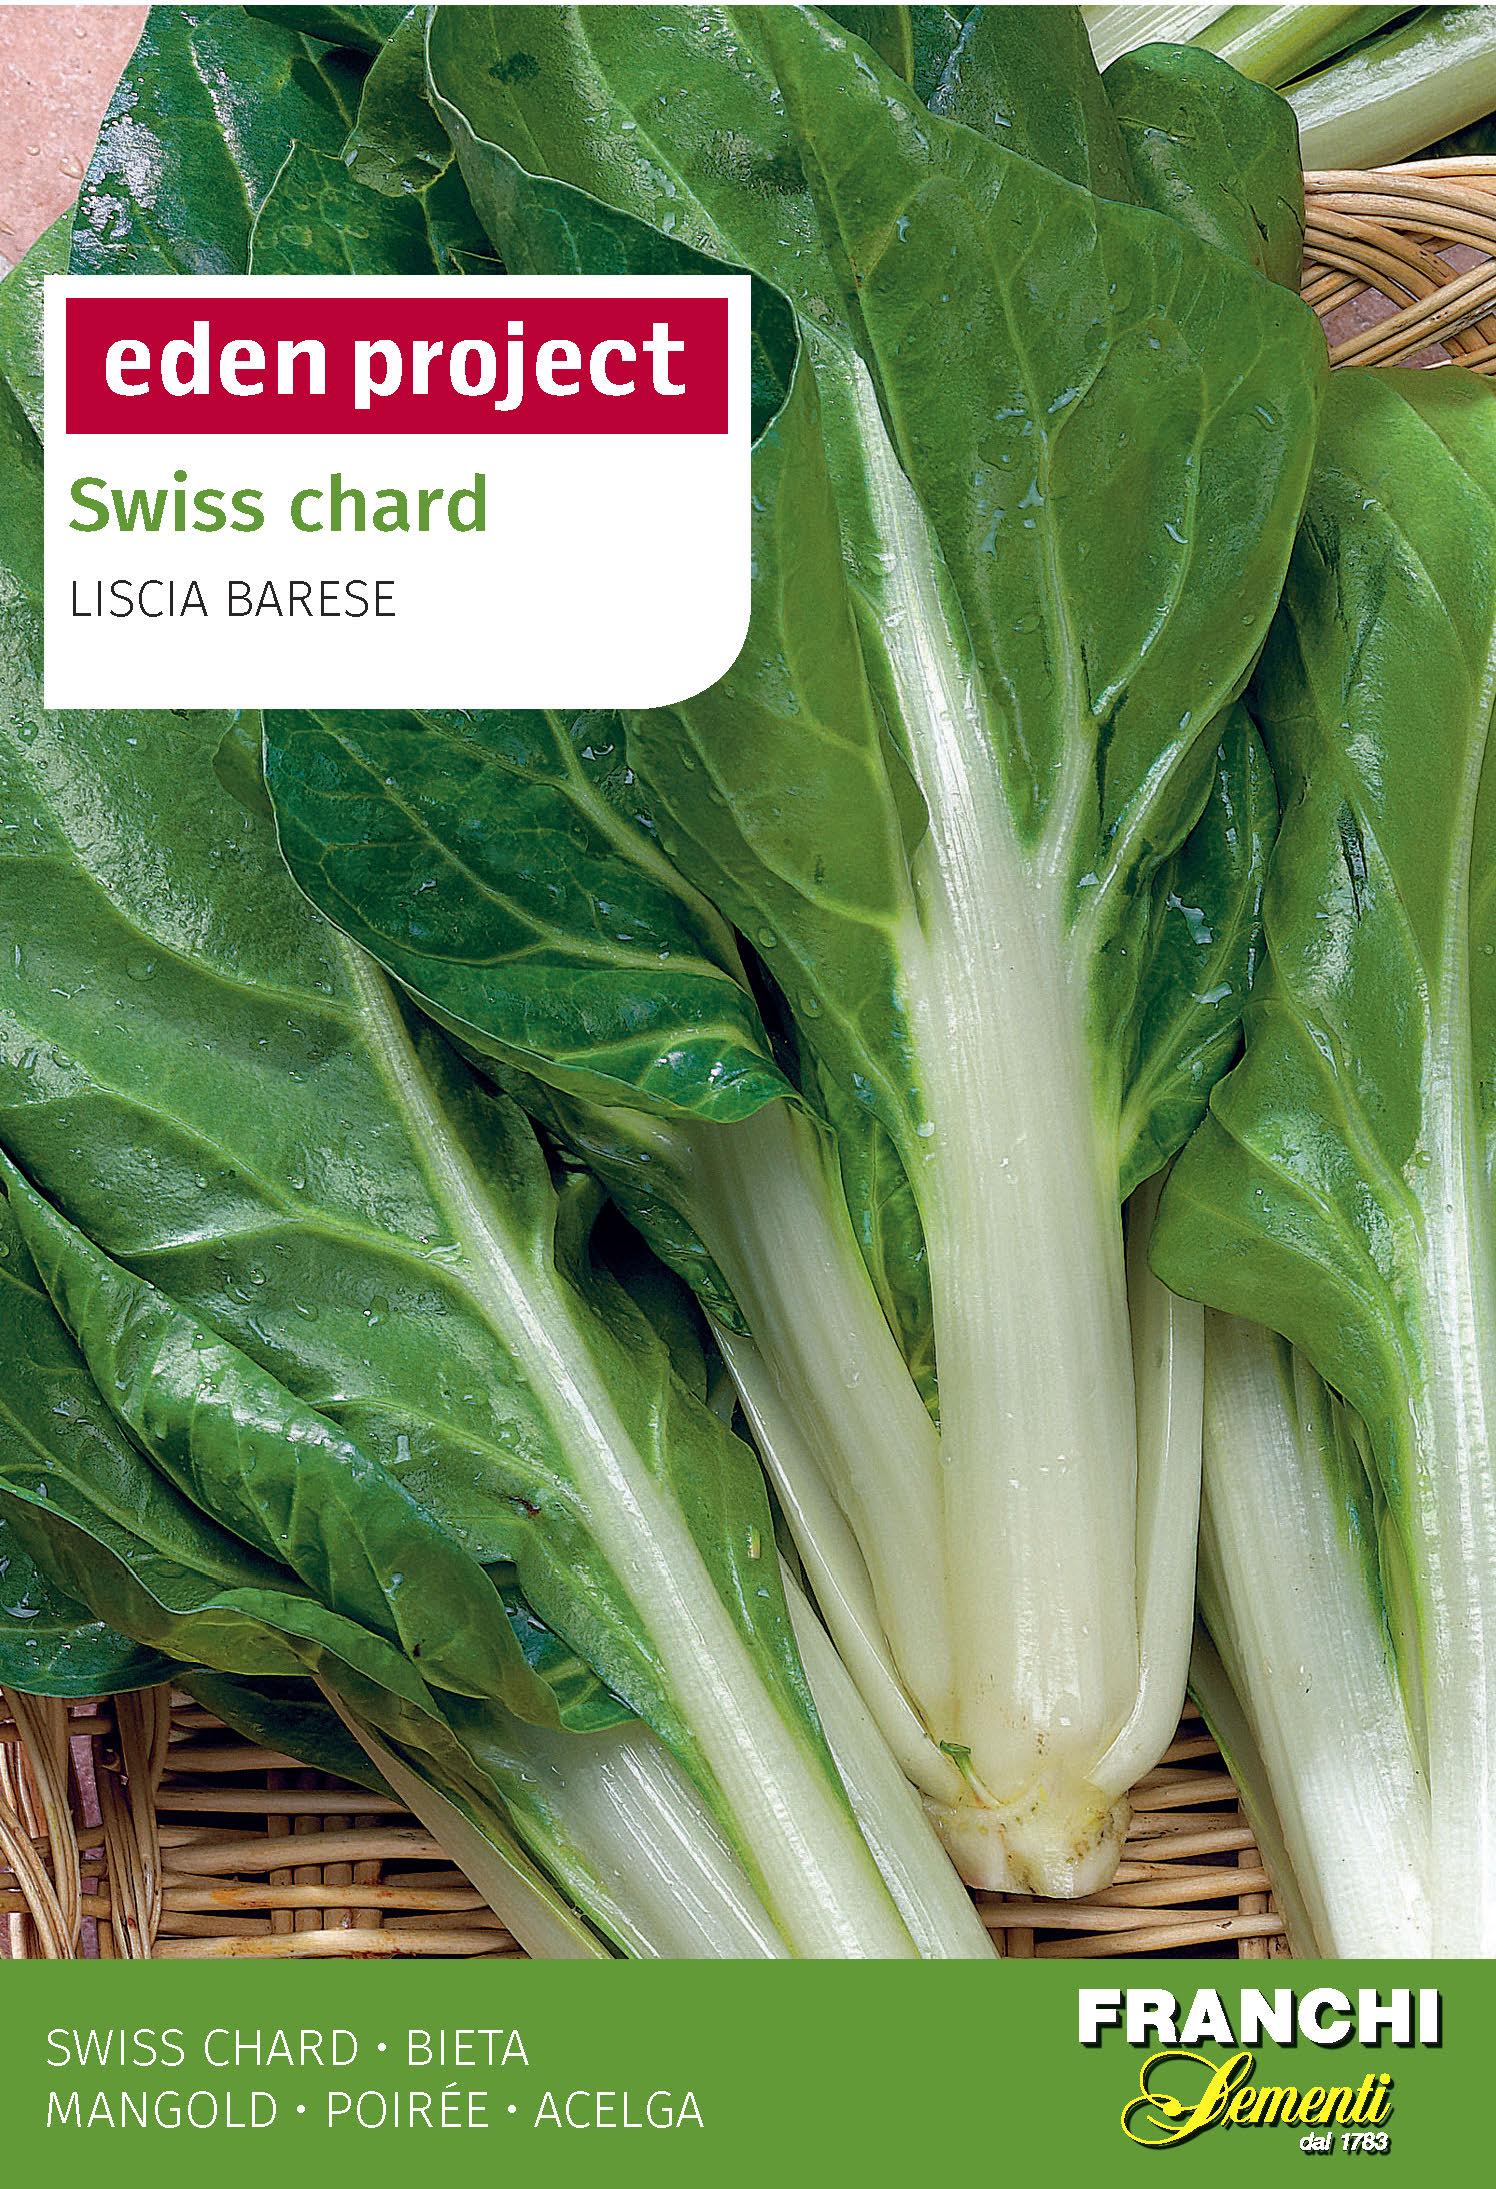 Swiss Chard 'Liscia Barese' - Beta vulgaris L